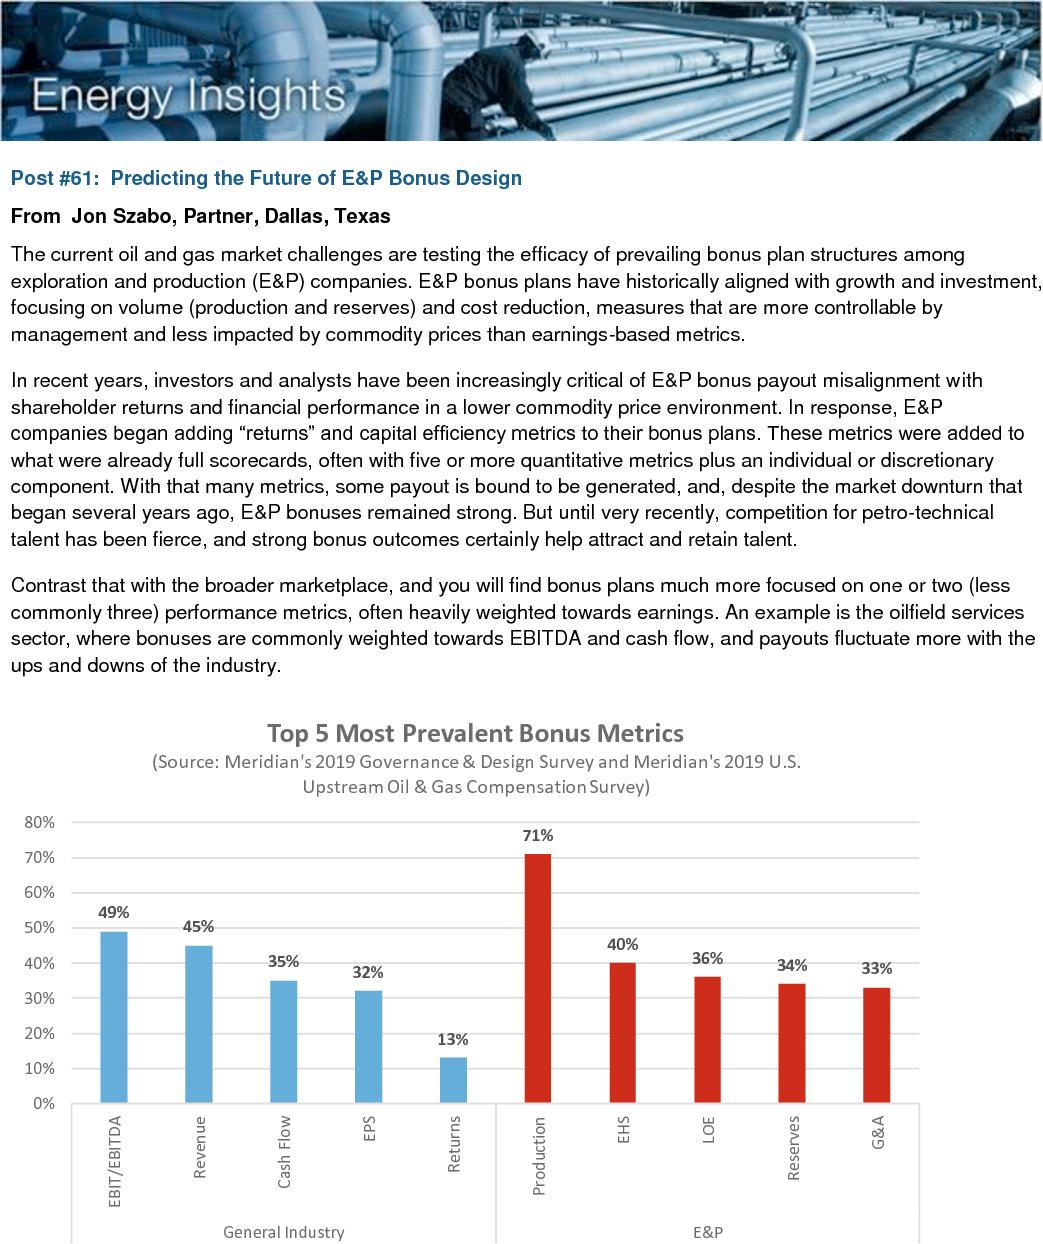 Predicting the Future of E&P Bonus Design (PDF)